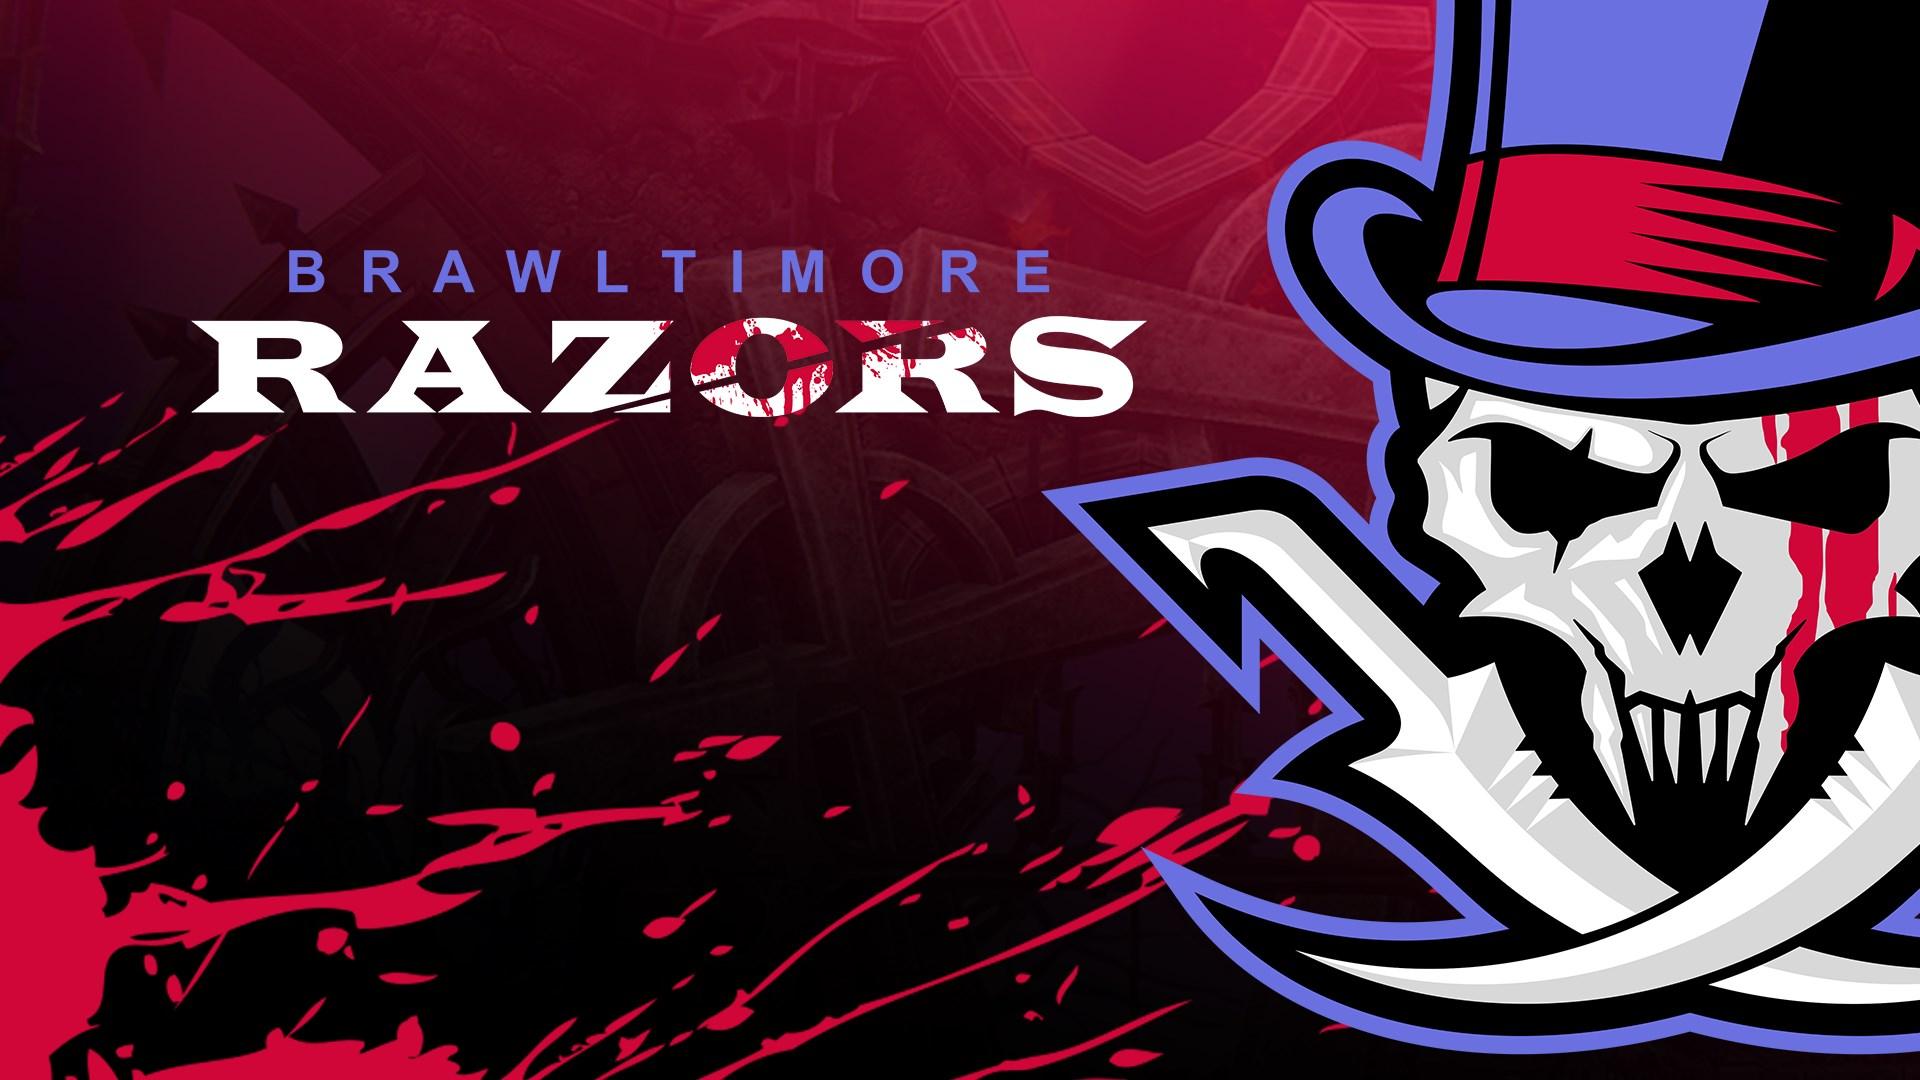 Brawltimore Razors